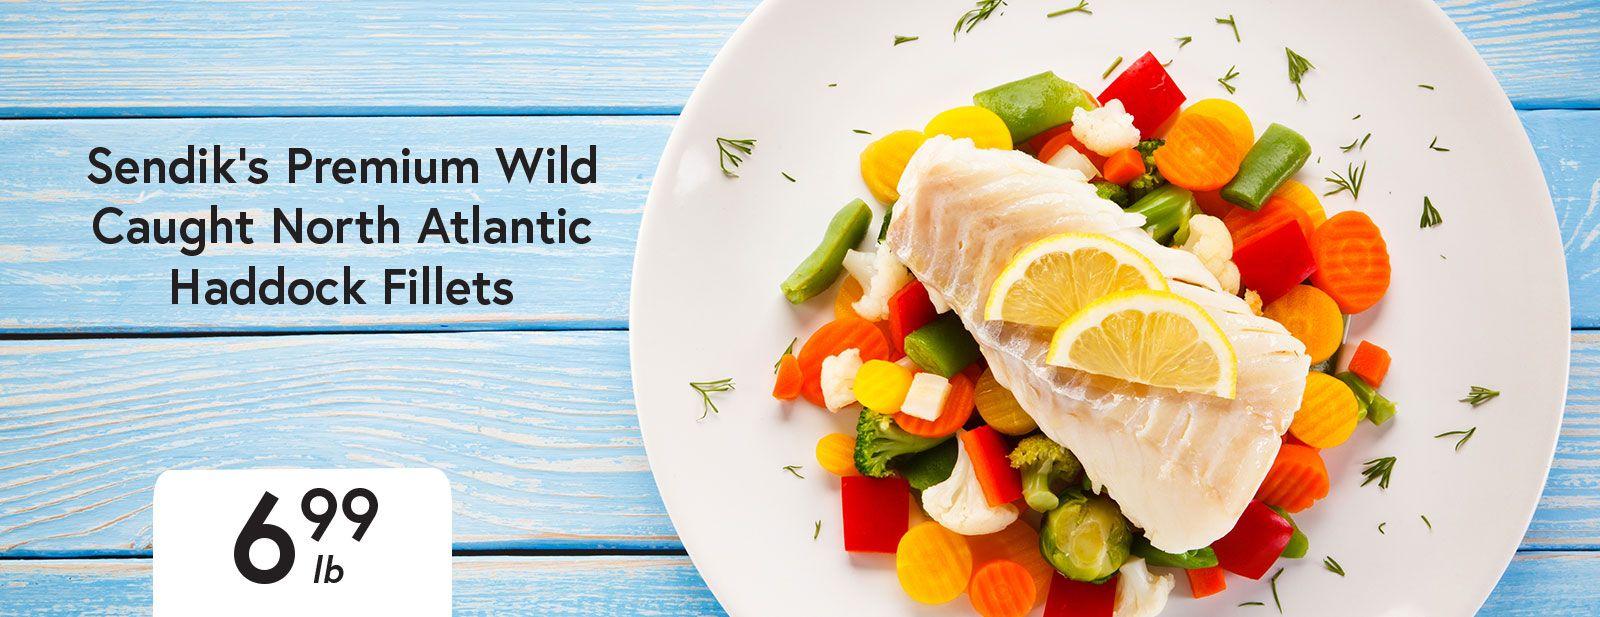 Sendik's Premium Wild Caught North Atlantic Haddock Fillets $6.99 lb